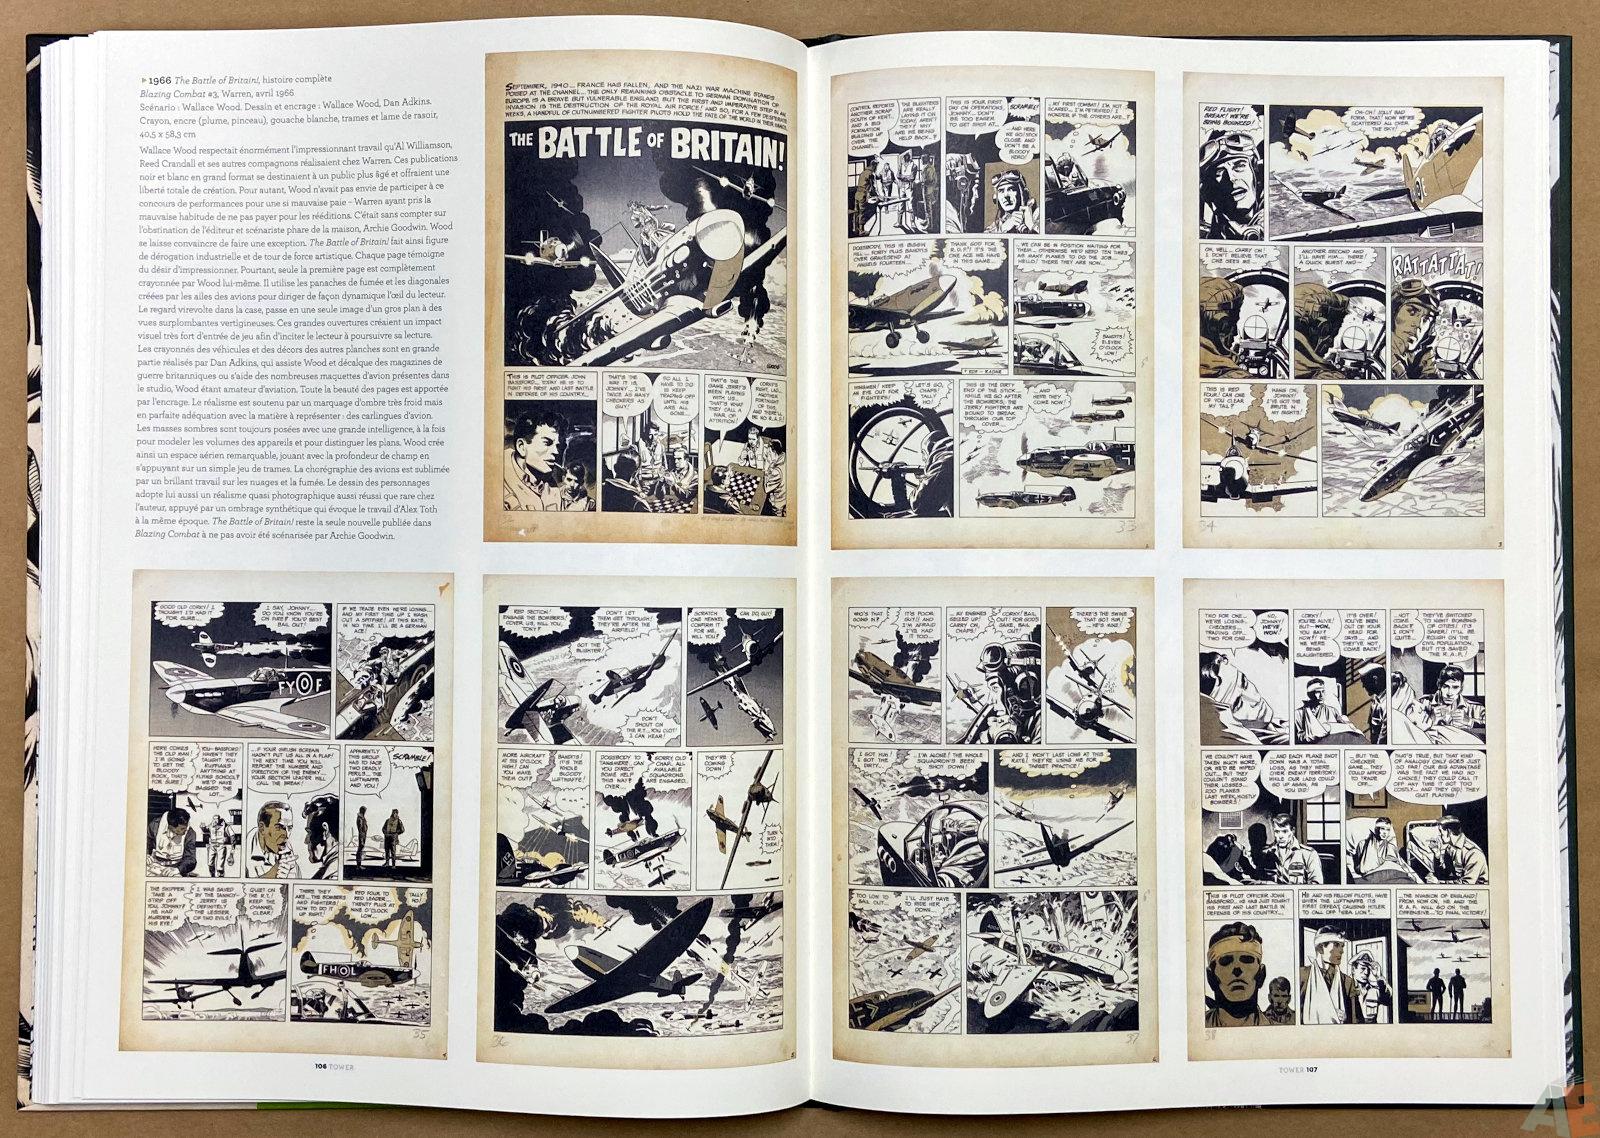 Les Mondes De Wallace Wood catalogue interior 14